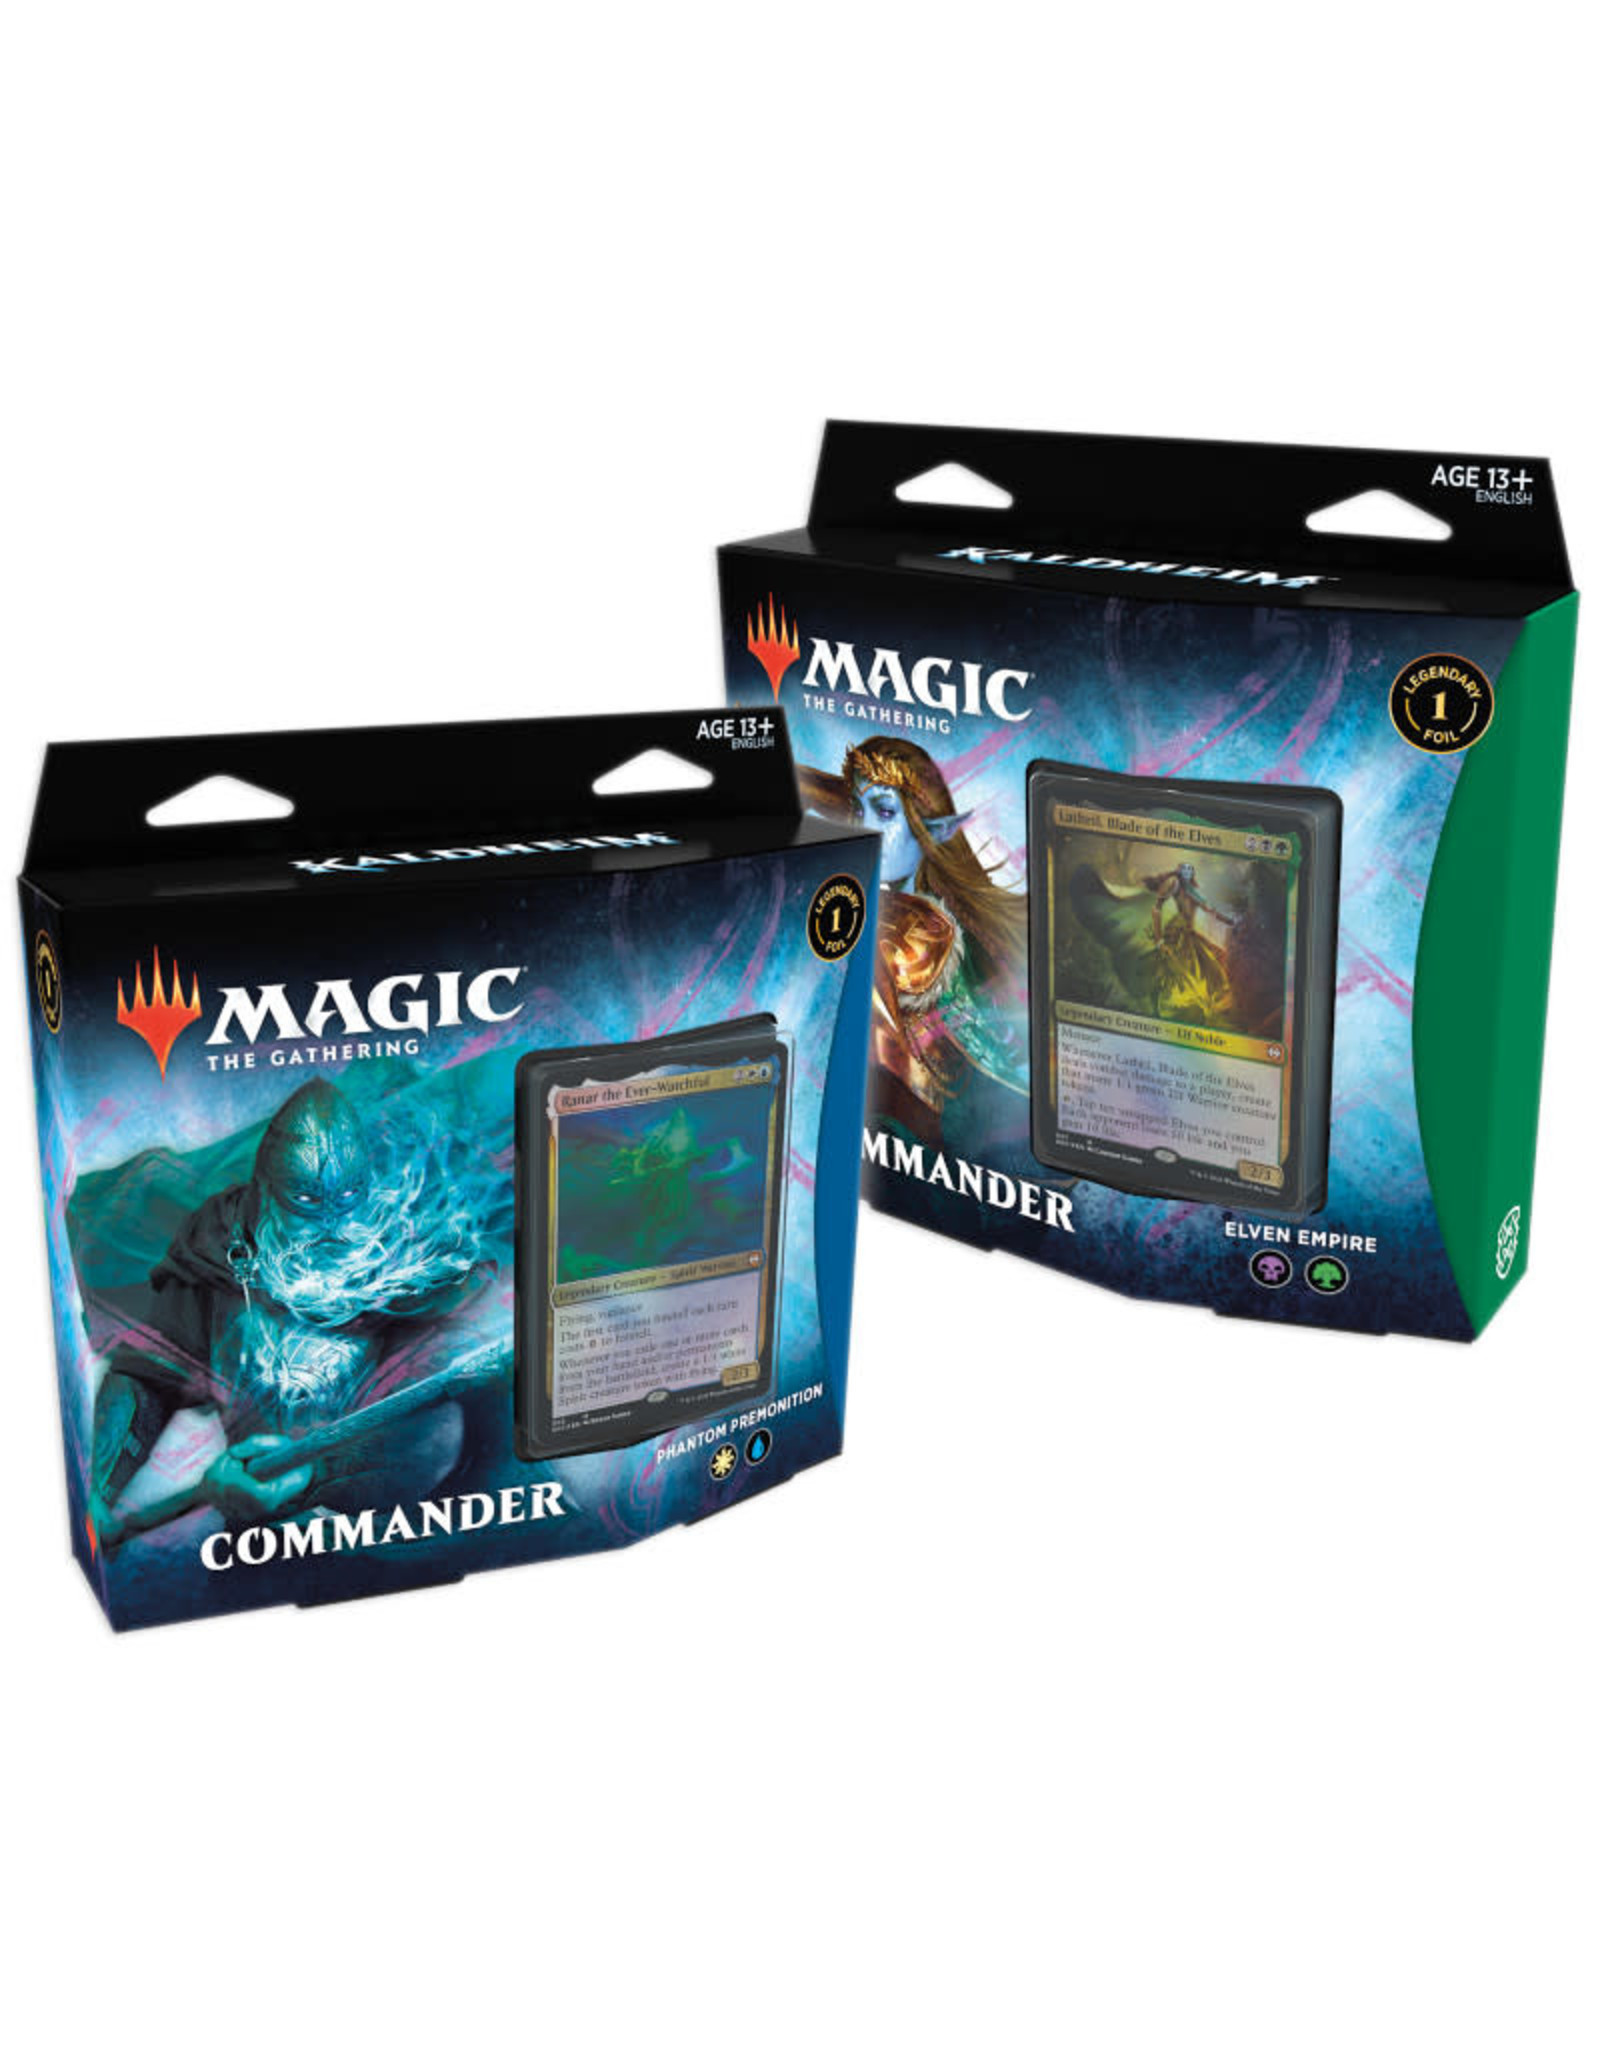 Wizards of the Coast MTG Kaldheim Commander Set of 2 Decks (Pre-Order)